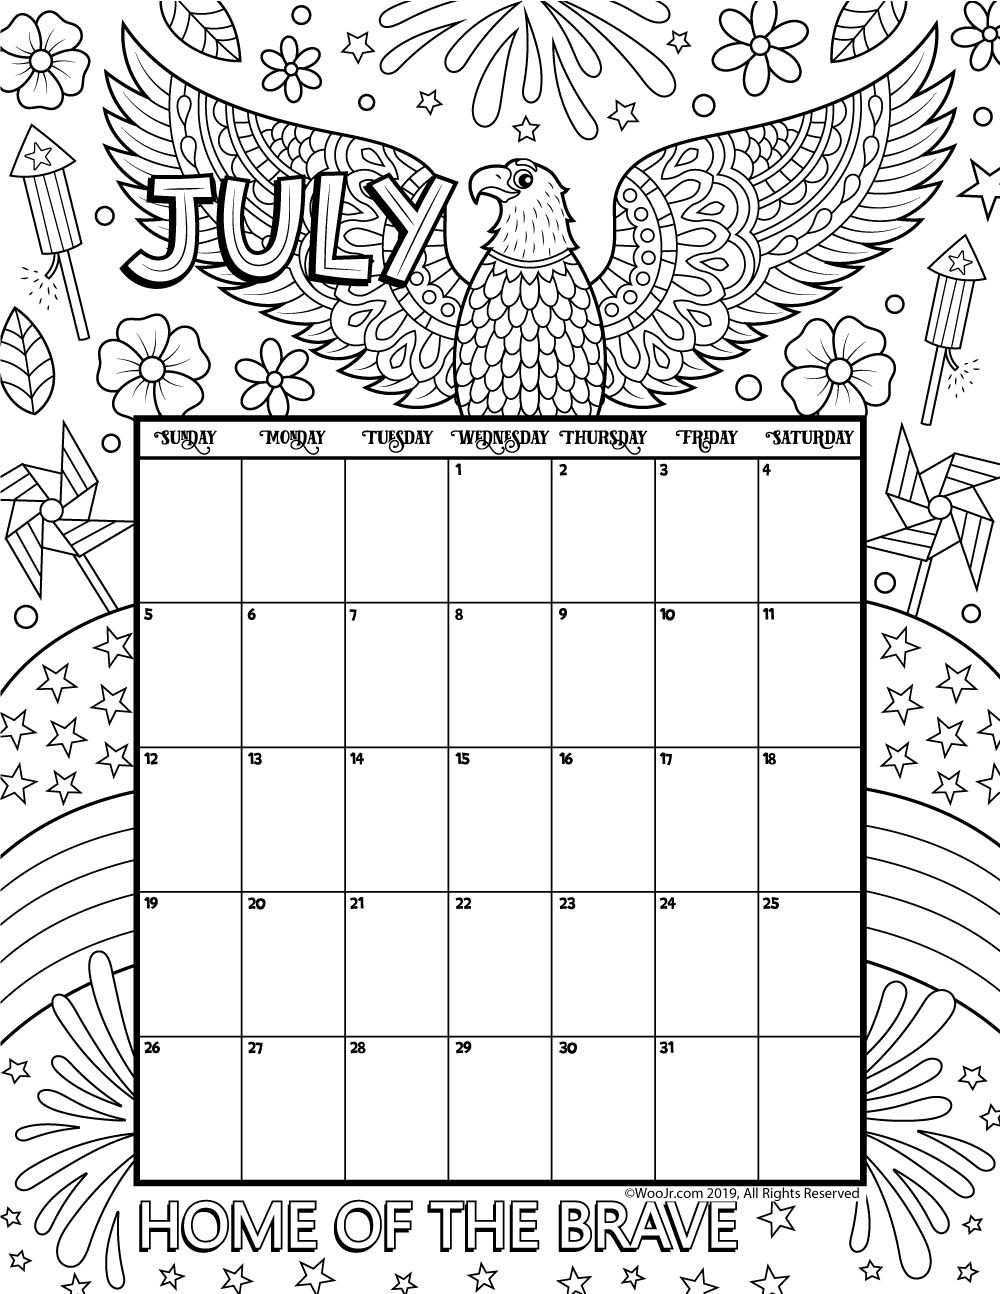 July 2020 Coloring Calendar Coloring calendar, Kids